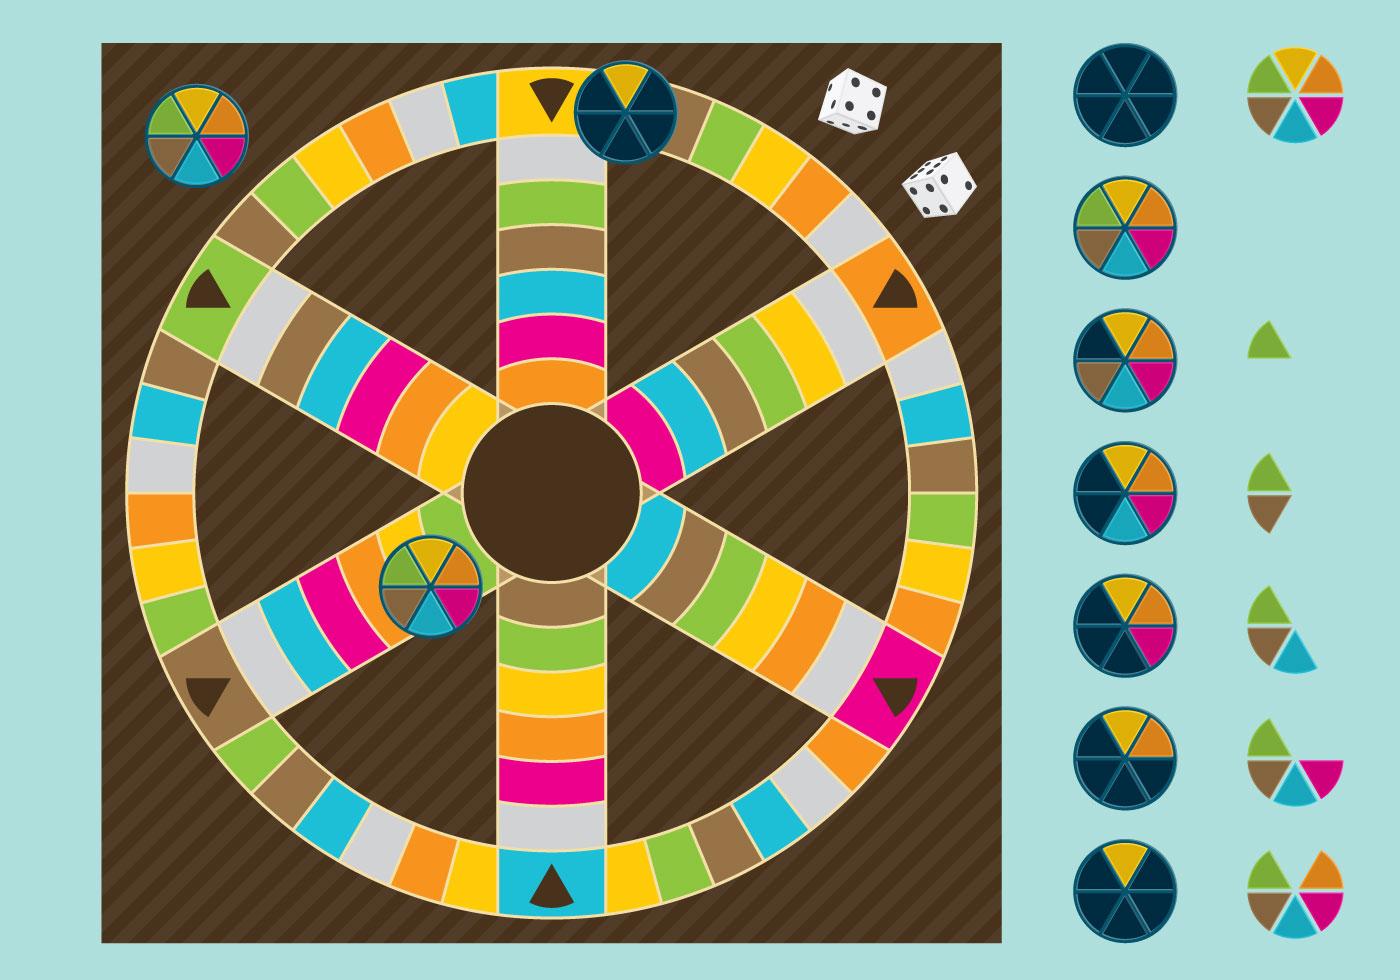 Trivia Board Game - Download Free Vector Art, Stock ... - photo#13